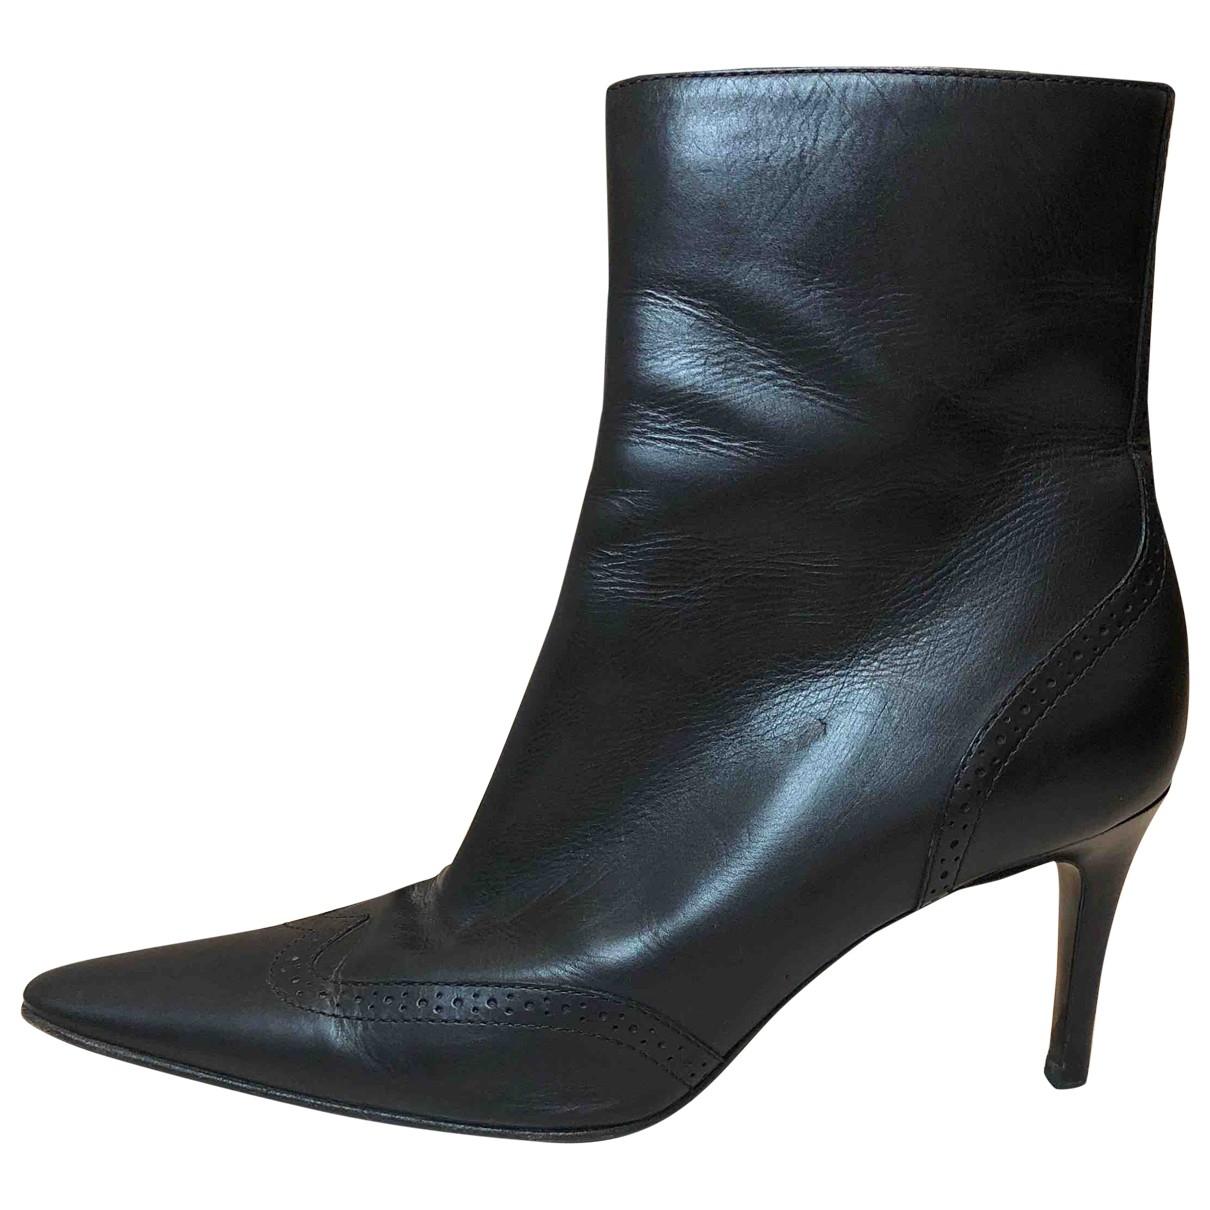 Ralph Lauren \N Black Leather Boots for Women 7.5 US